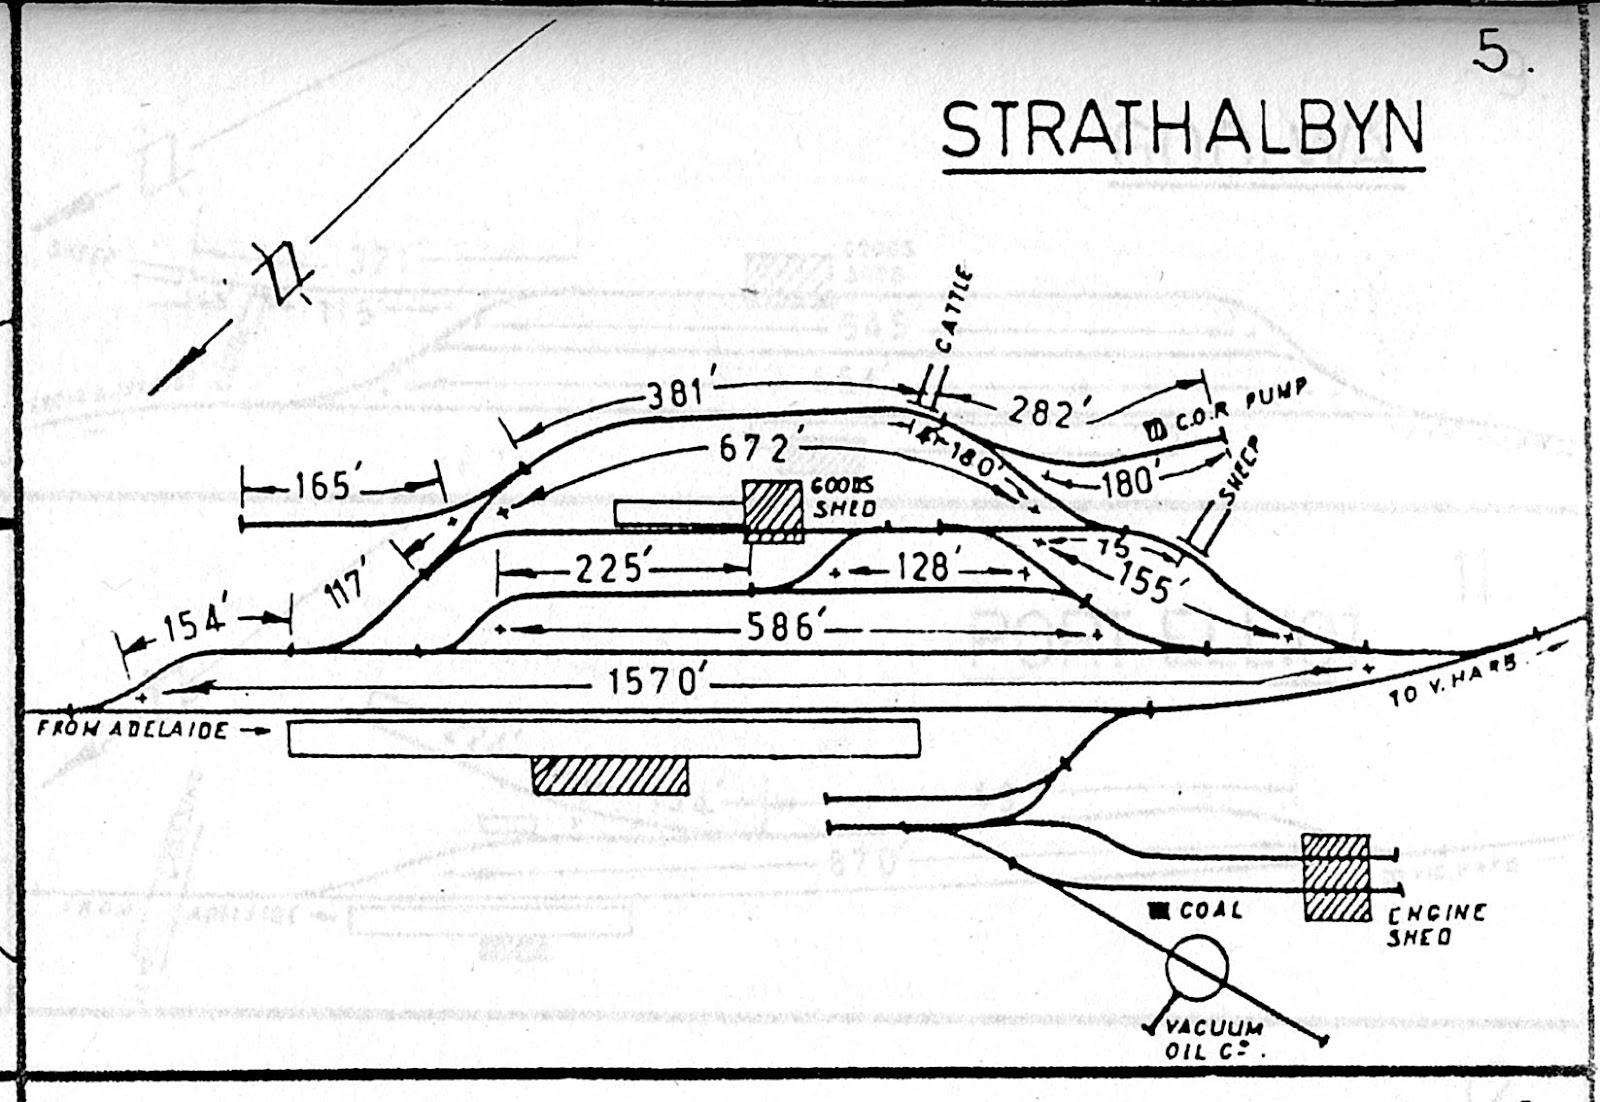 Strathalbyn In N Scale Plans